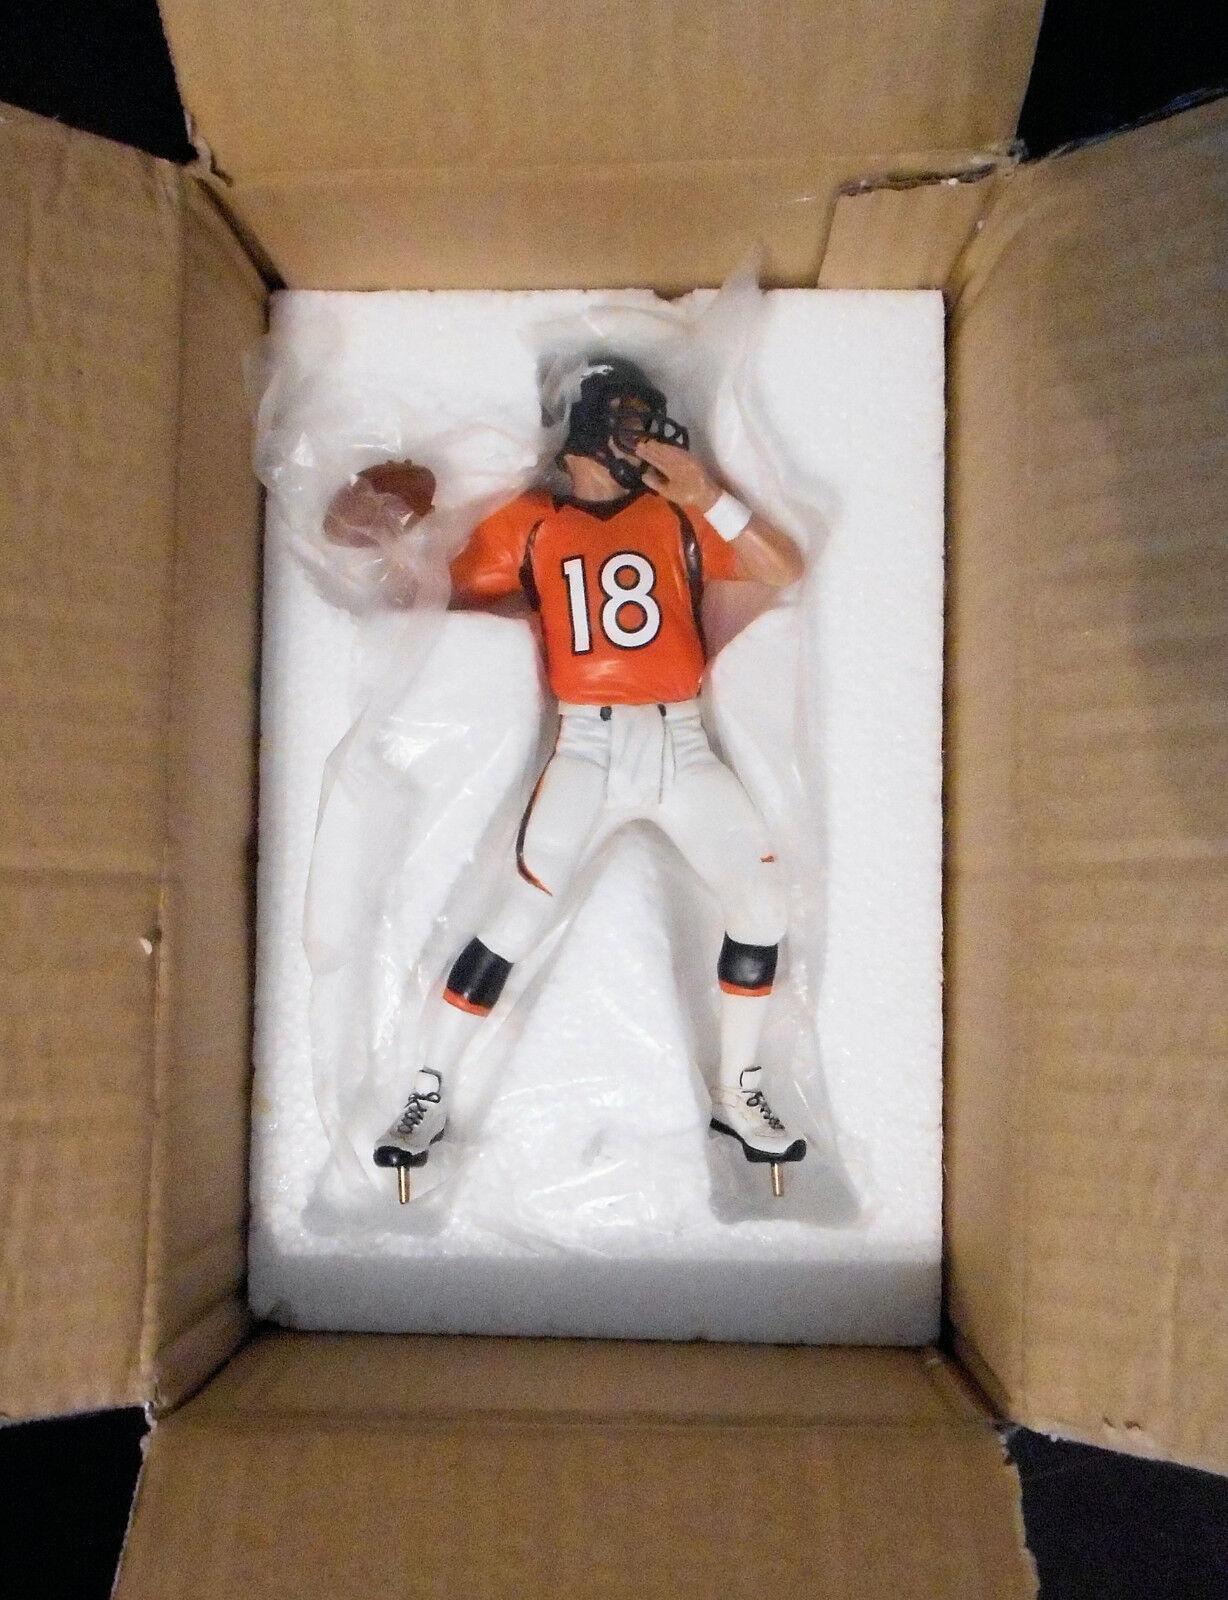 Peyton Manning Danbury Mint Figurine Rare Denver Broncos Figure New in Box NIB